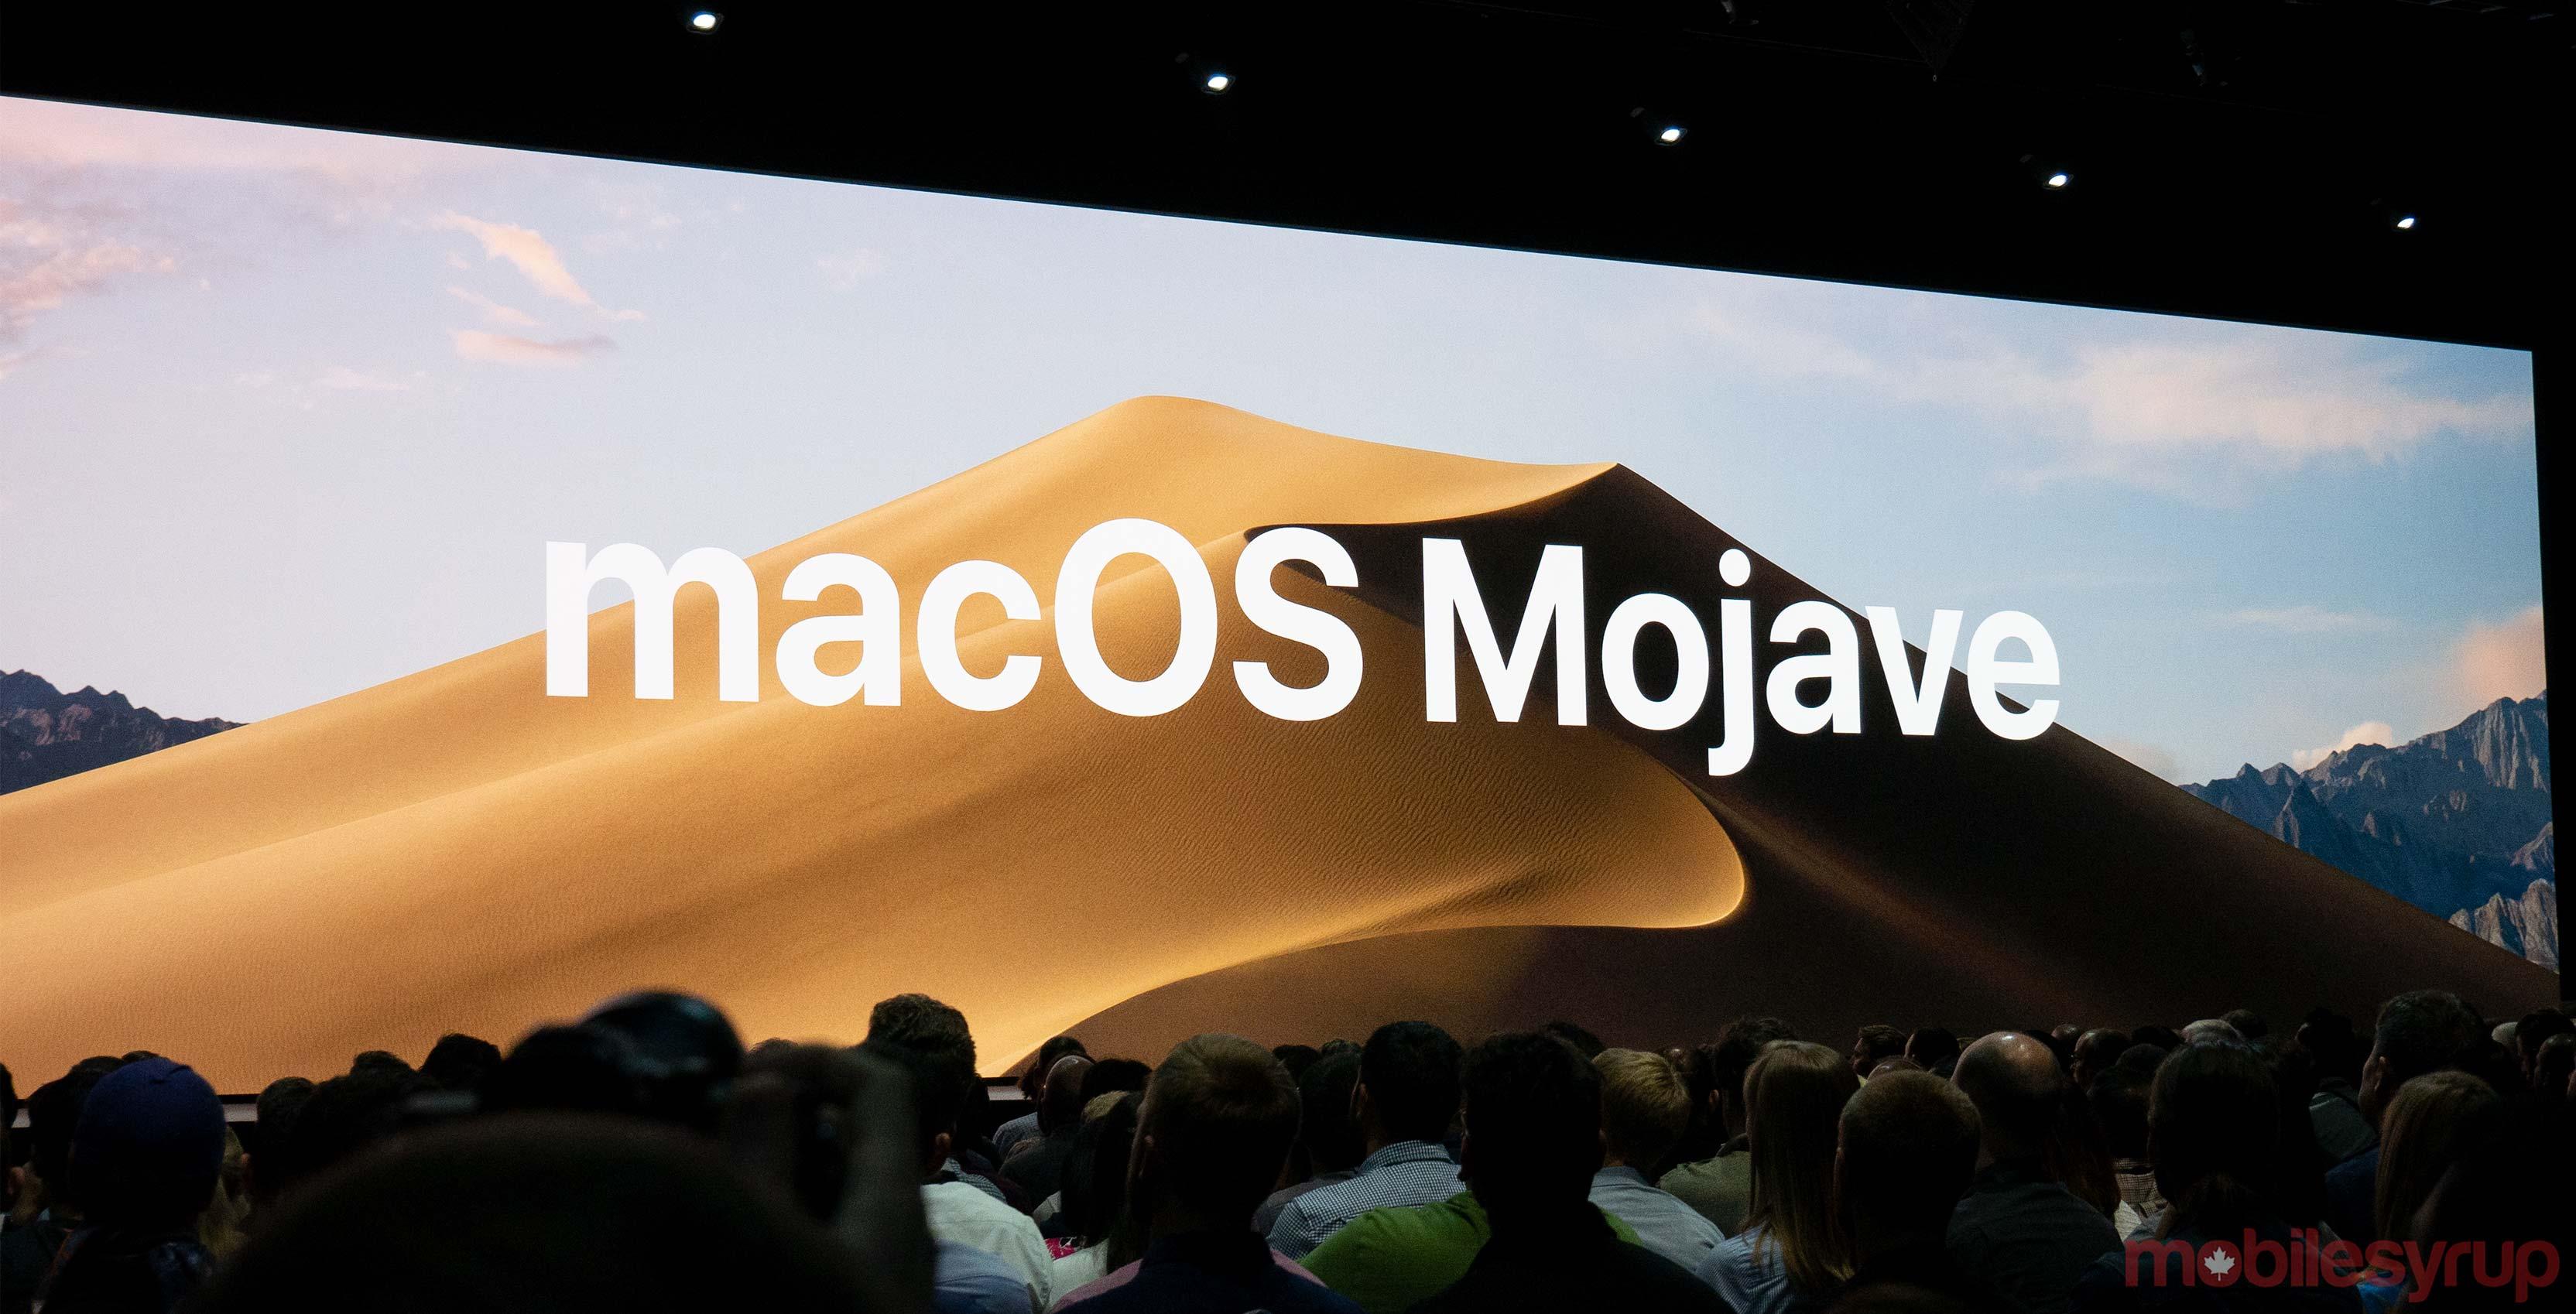 Apple announces macOS Mojave, redesigned app store, dark mode